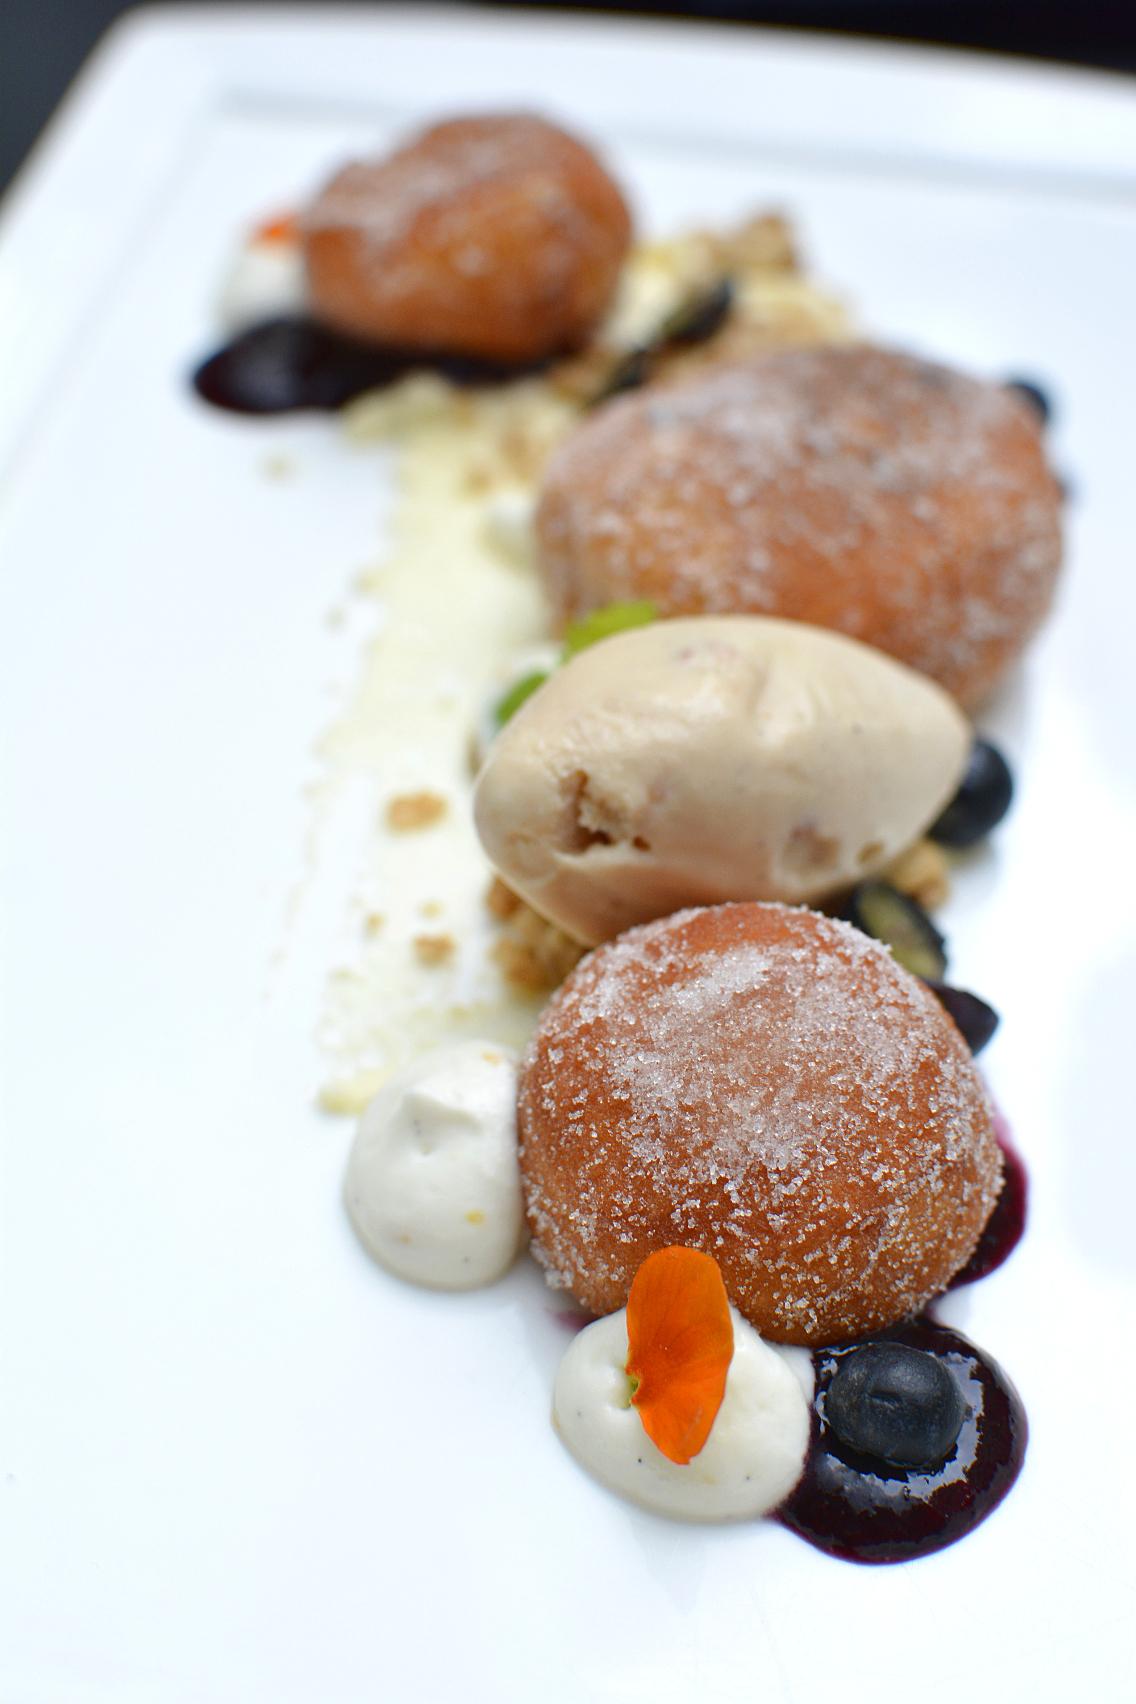 Sofitel Chicago Chestnut Provisions Blueberry Doughnuts 1